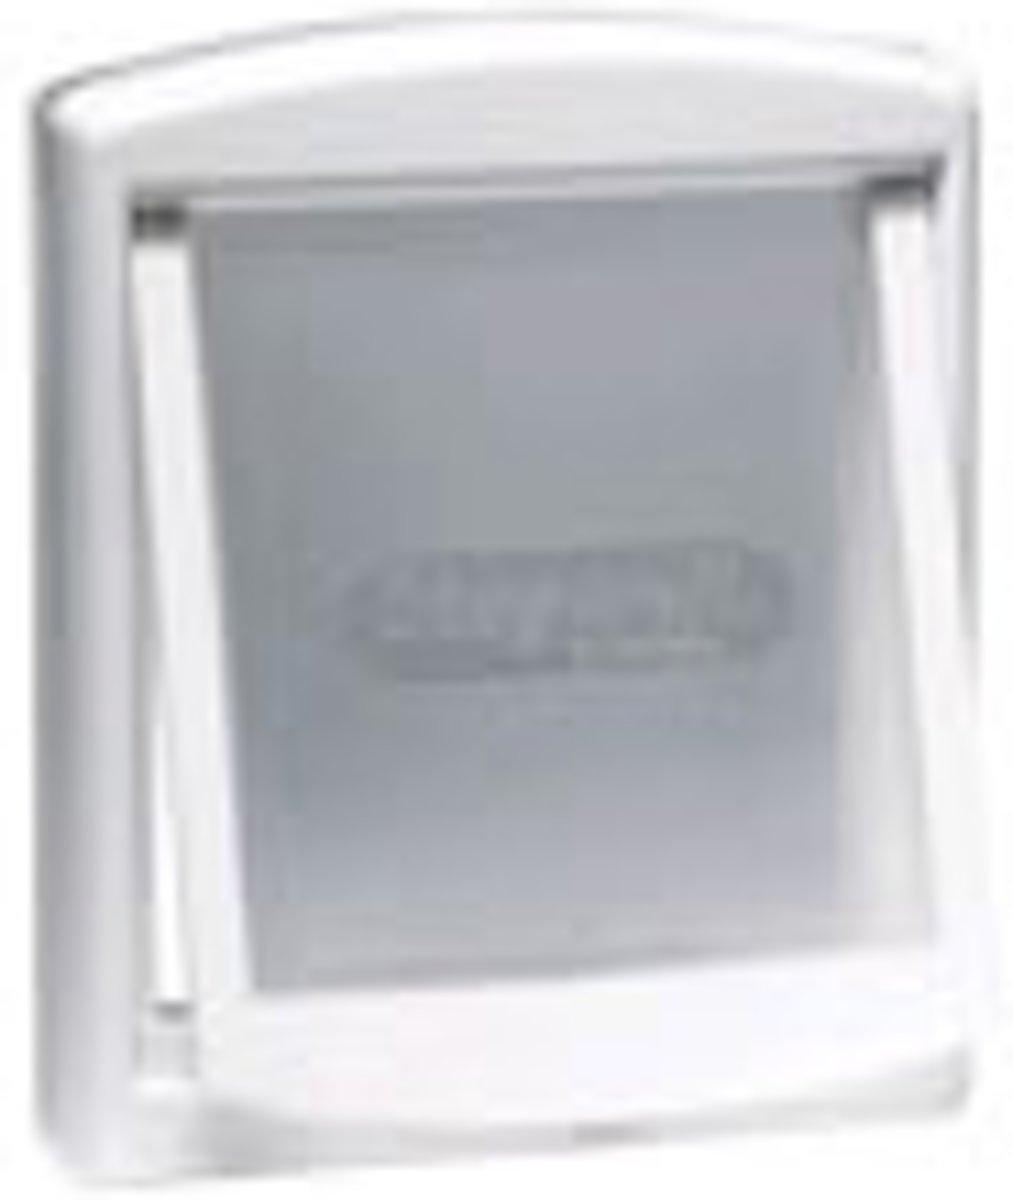 Staywell 760 Hondenluik - Large - Wit/Transparant kopen